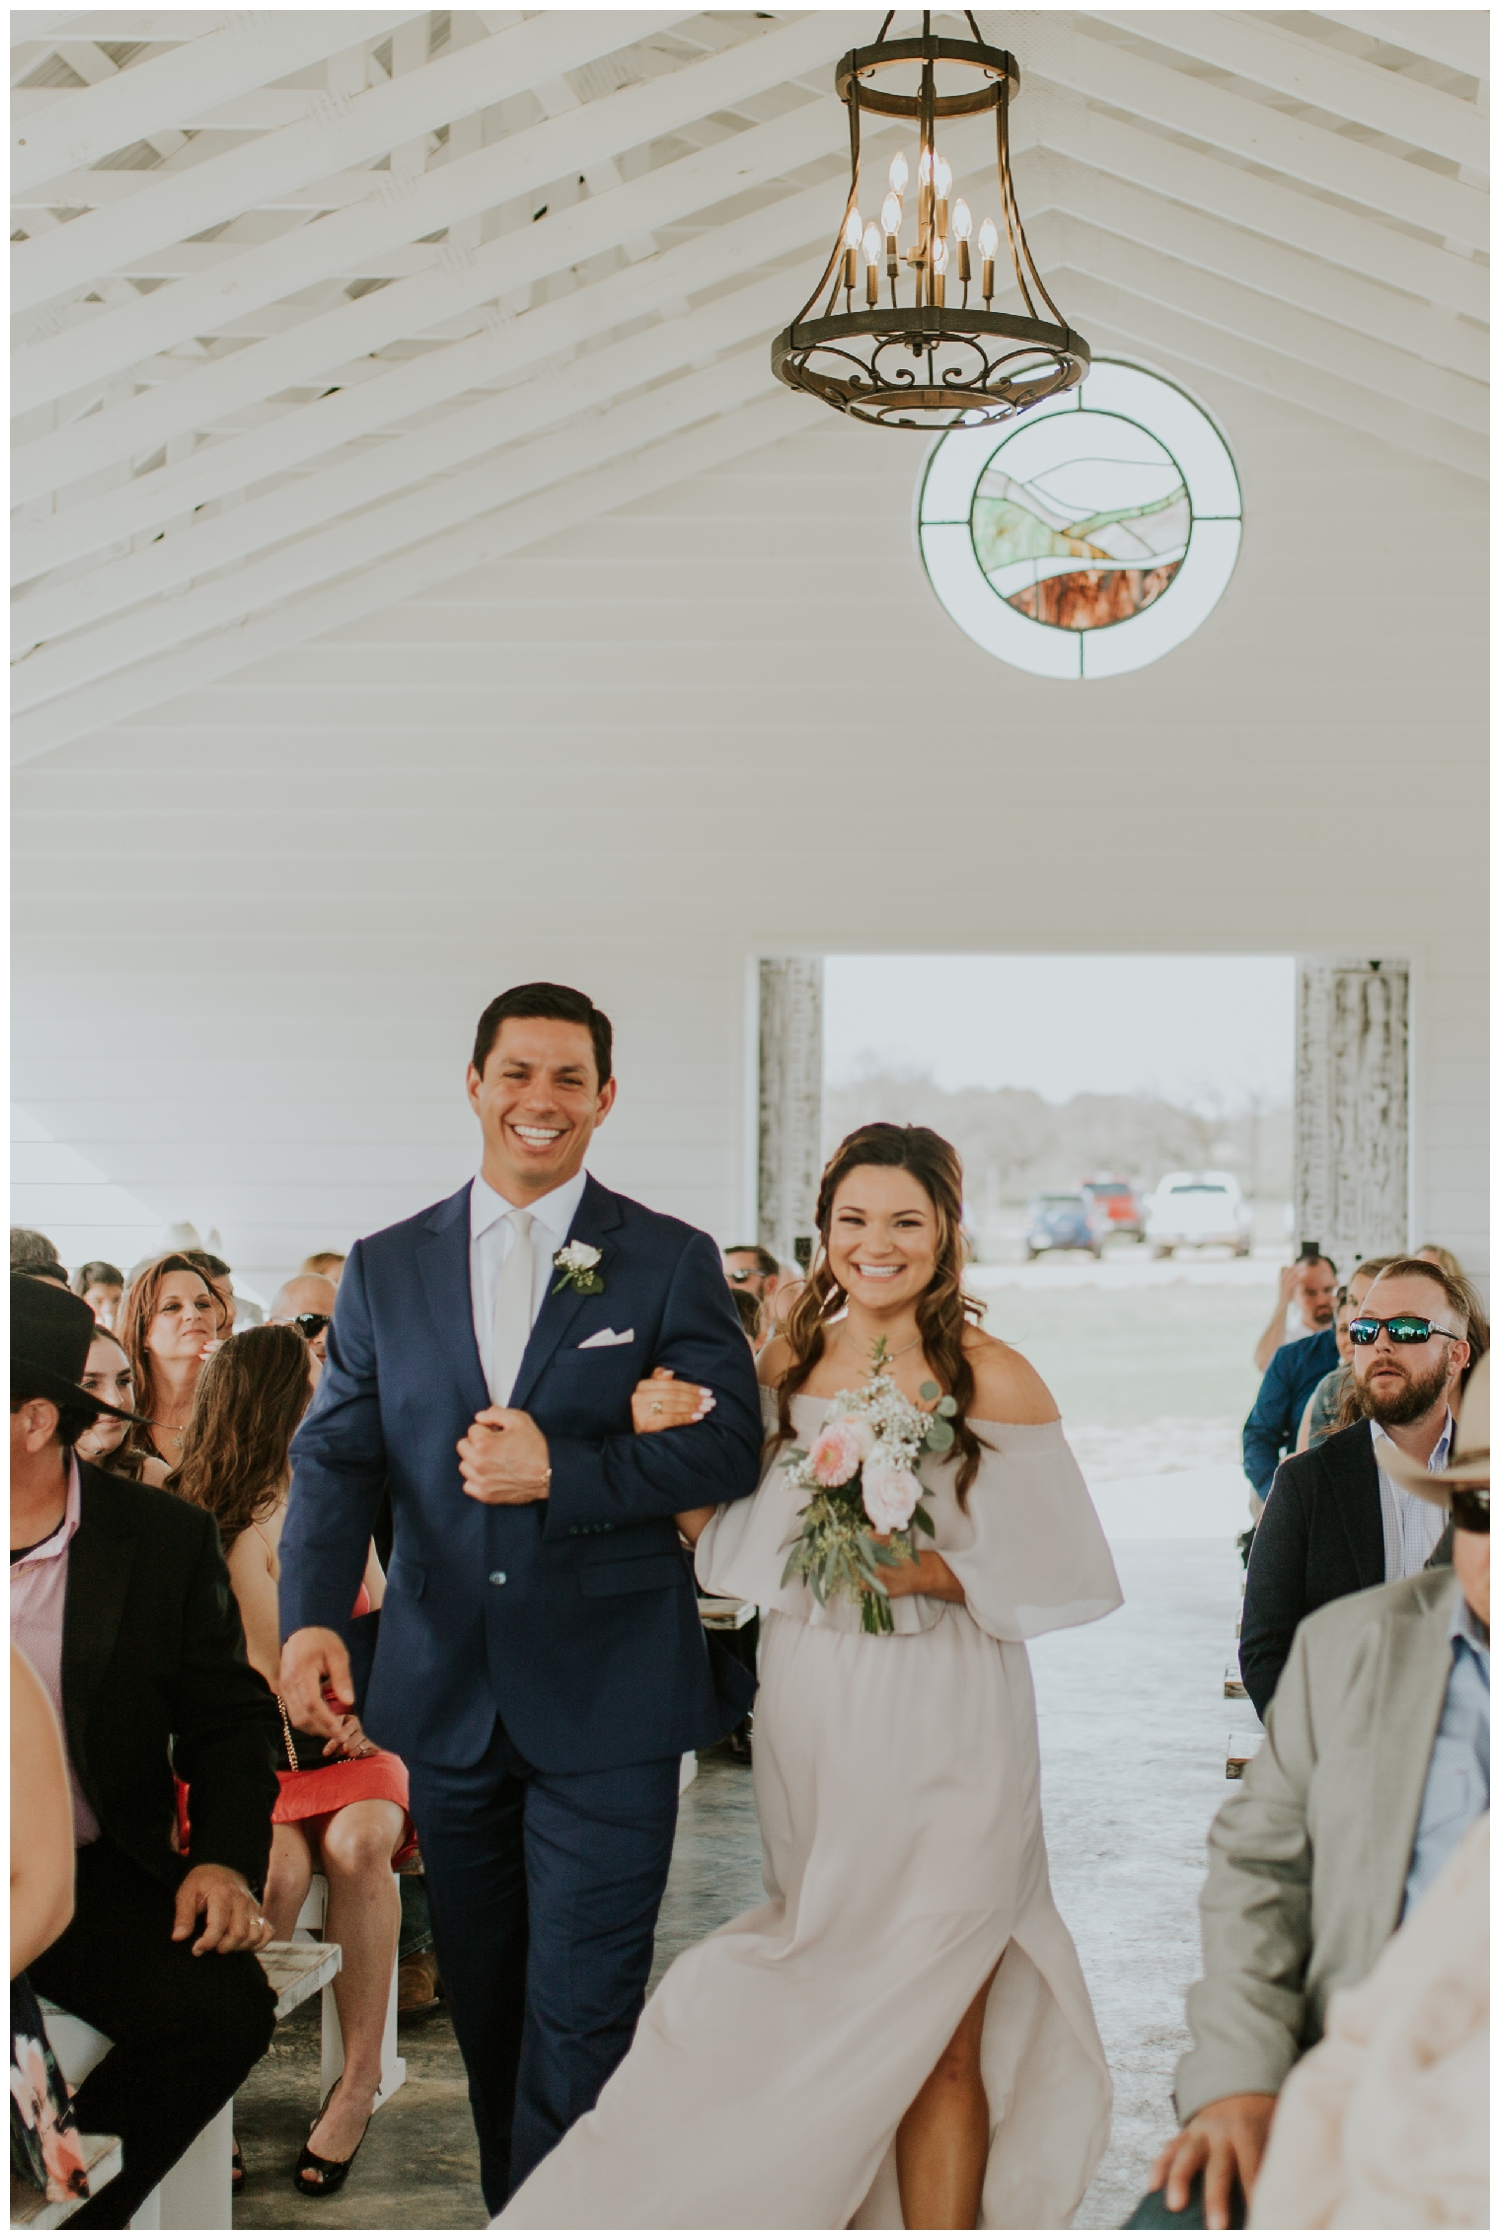 Ashlee+Mike, Featherstone Ranch Spring Wedding, San Antonio, Contista Productions Wedding Photography_0050.jpg